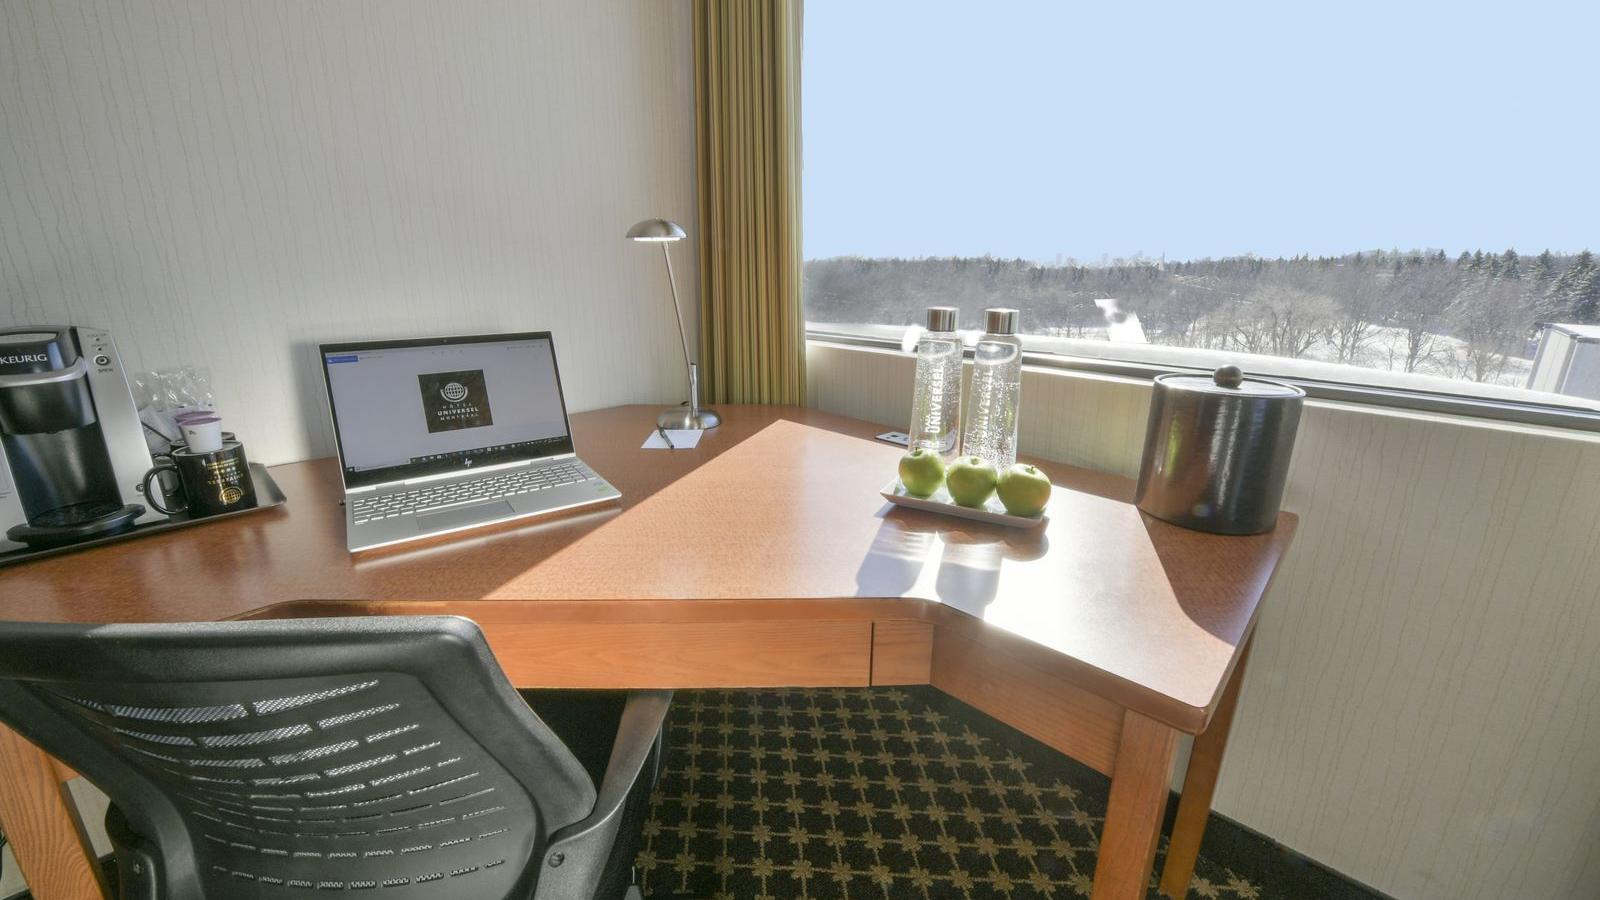 Laptop, bottled water and apples on desk.